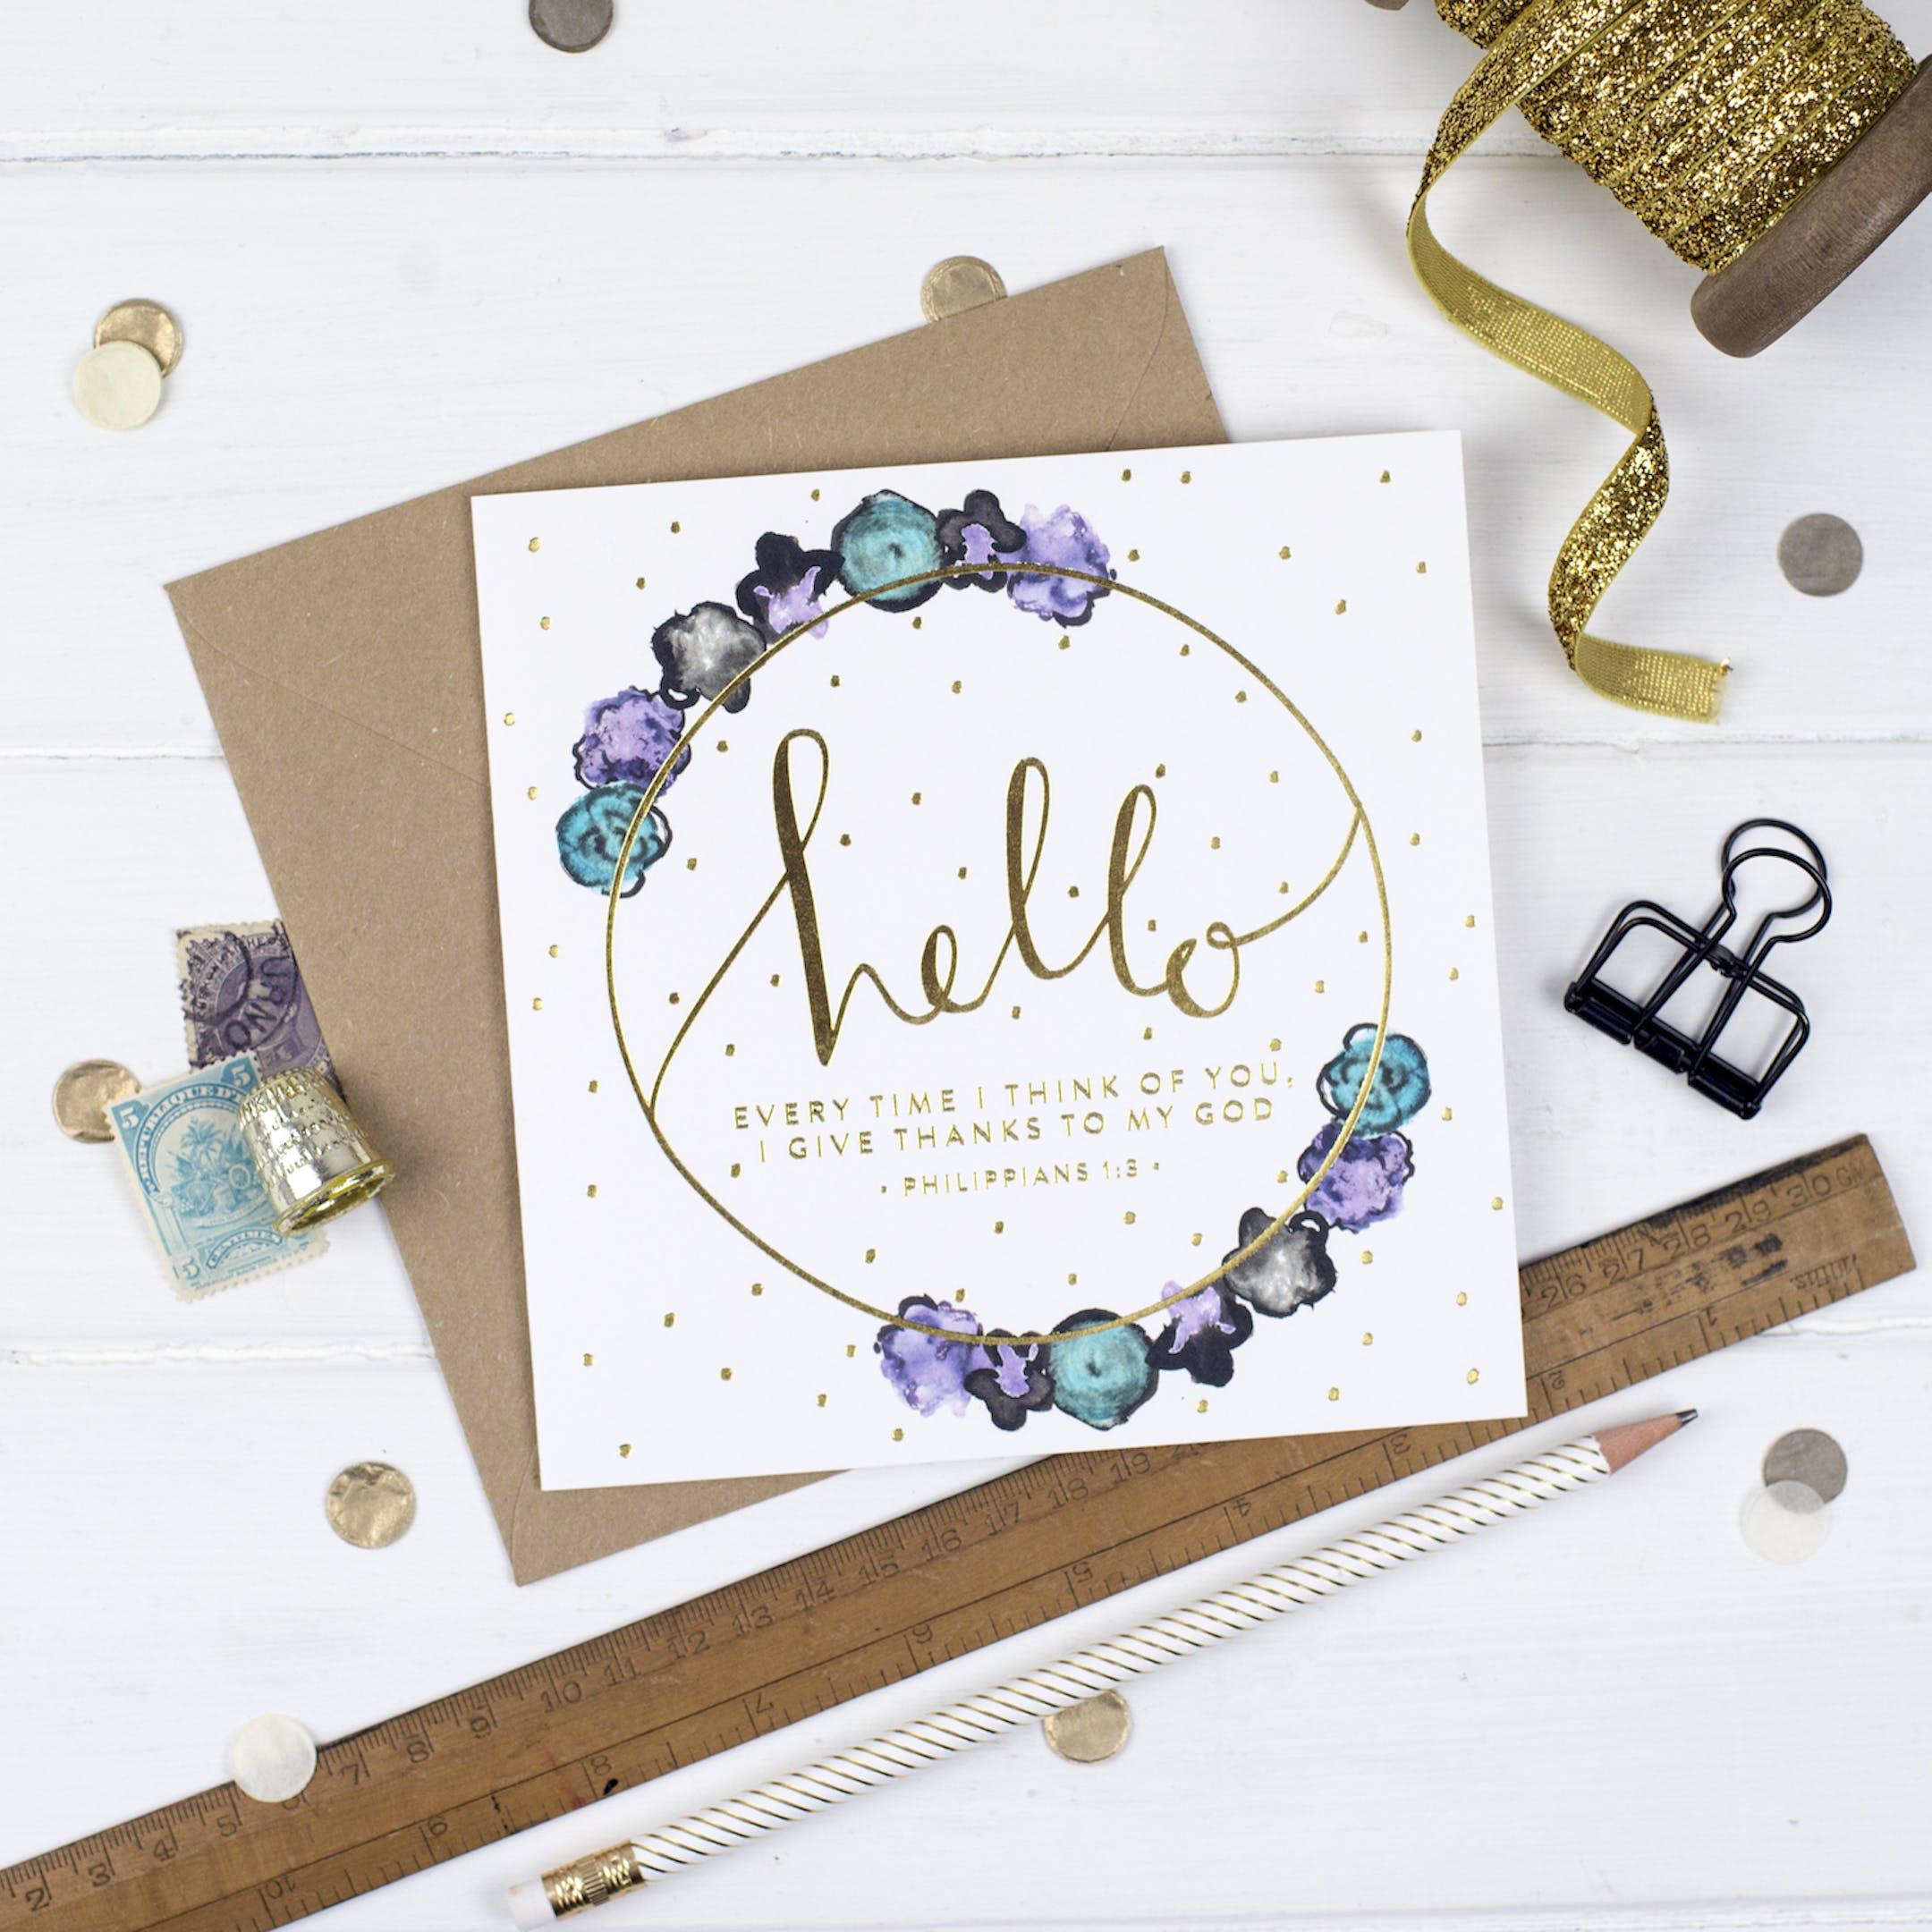 Luxury Christian Card - Philippians 1:3